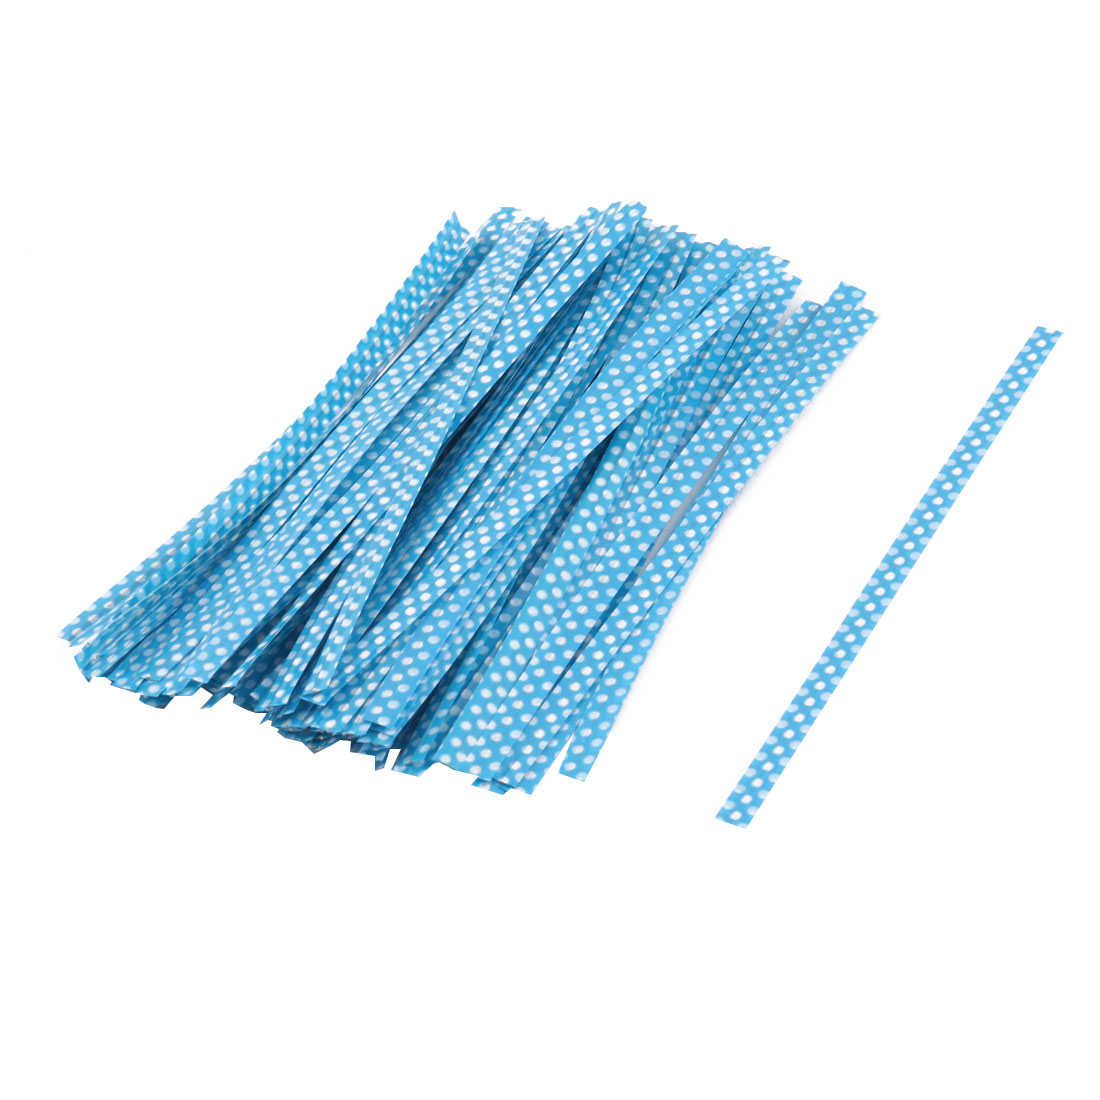 Plastic Dots Pattern Candy Bags Packaging Twist Ties Blue 10cm Length 100 Pcs